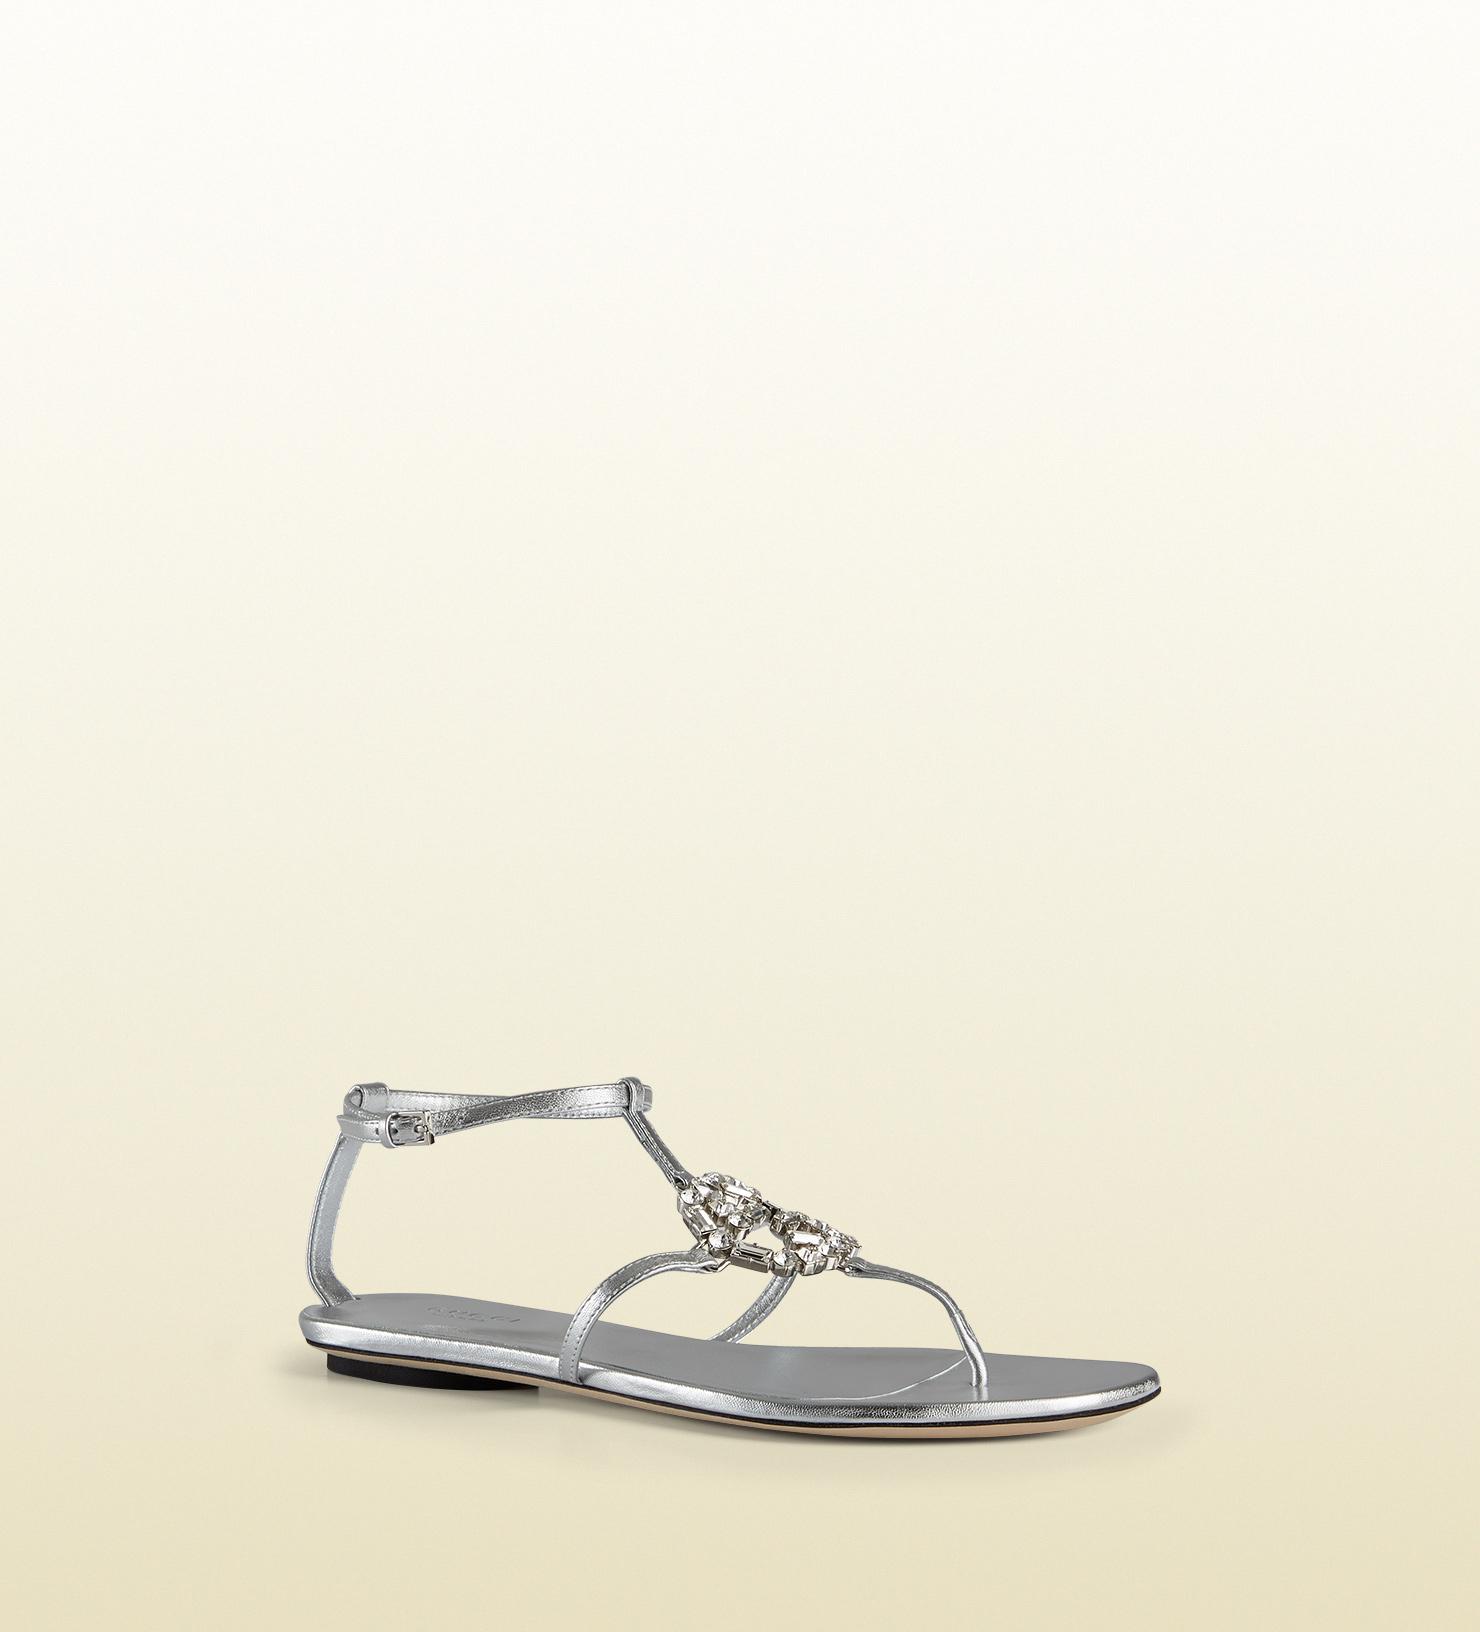 9fdd71abb69 Lyst - Gucci Gg Sparkling Metallic Leather Thong Sandal in Metallic